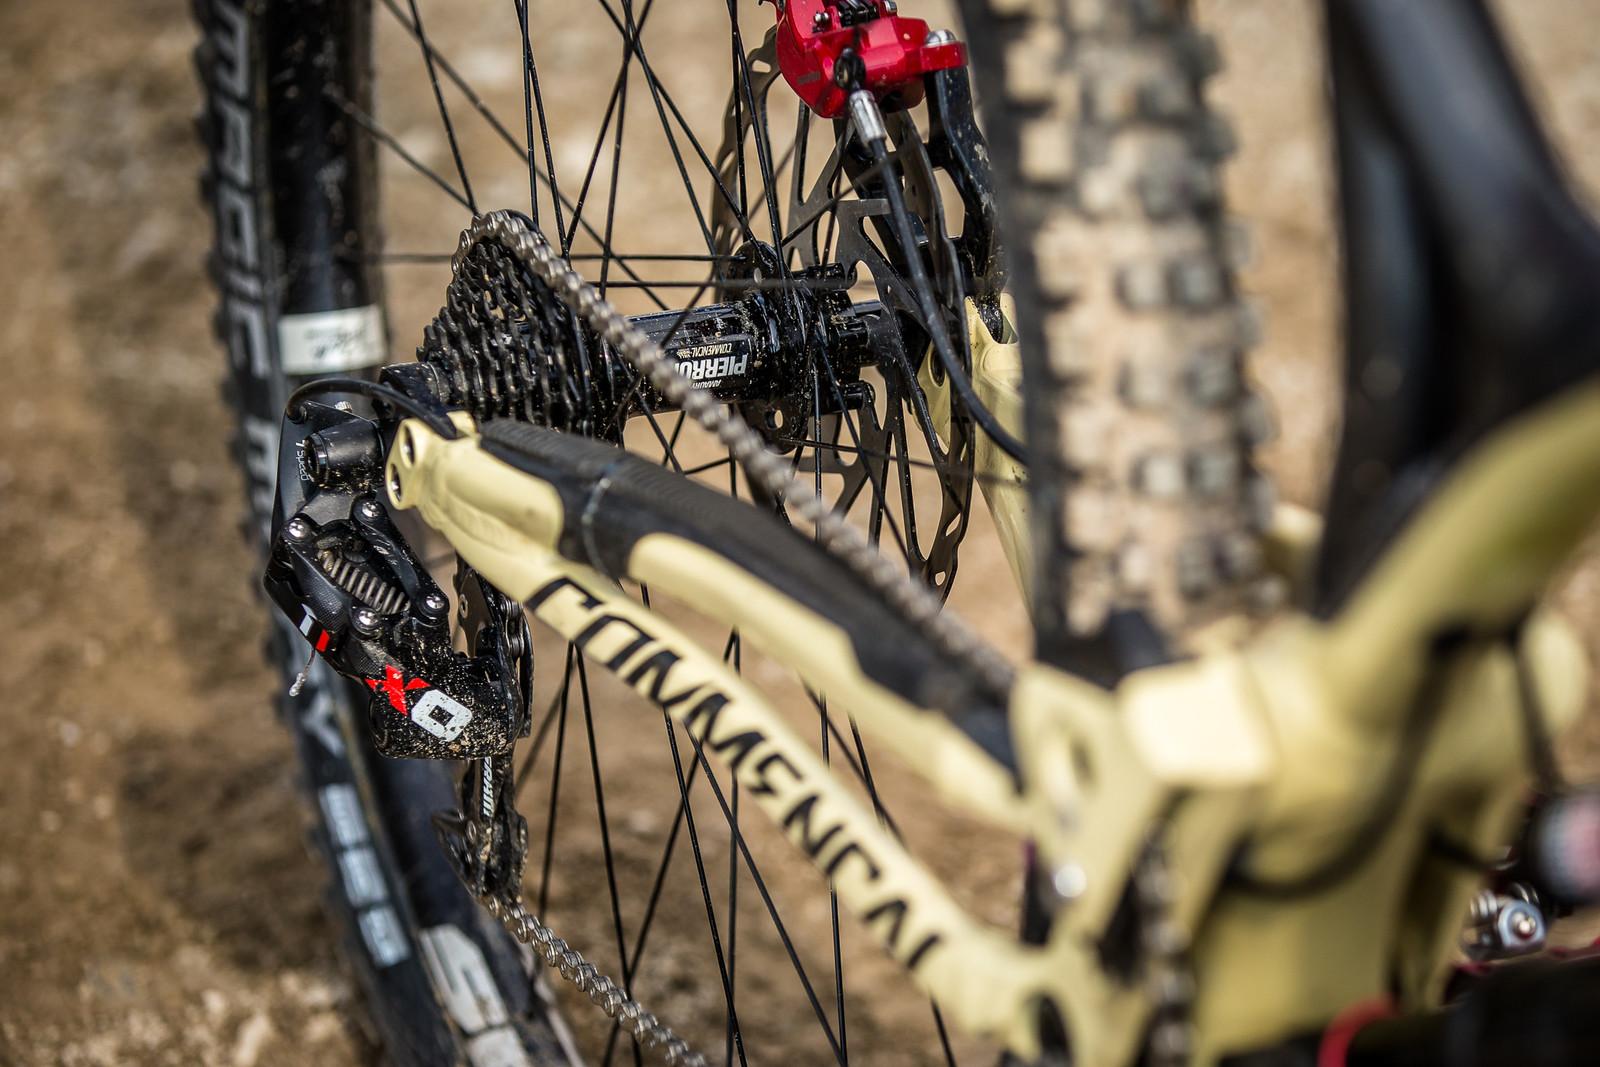 SRAM X0 DH Drivetrain - WINNING BIKE - Amaury Pierron's Commencal Supreme DH 29 - Mountain Biking Pictures - Vital MTB